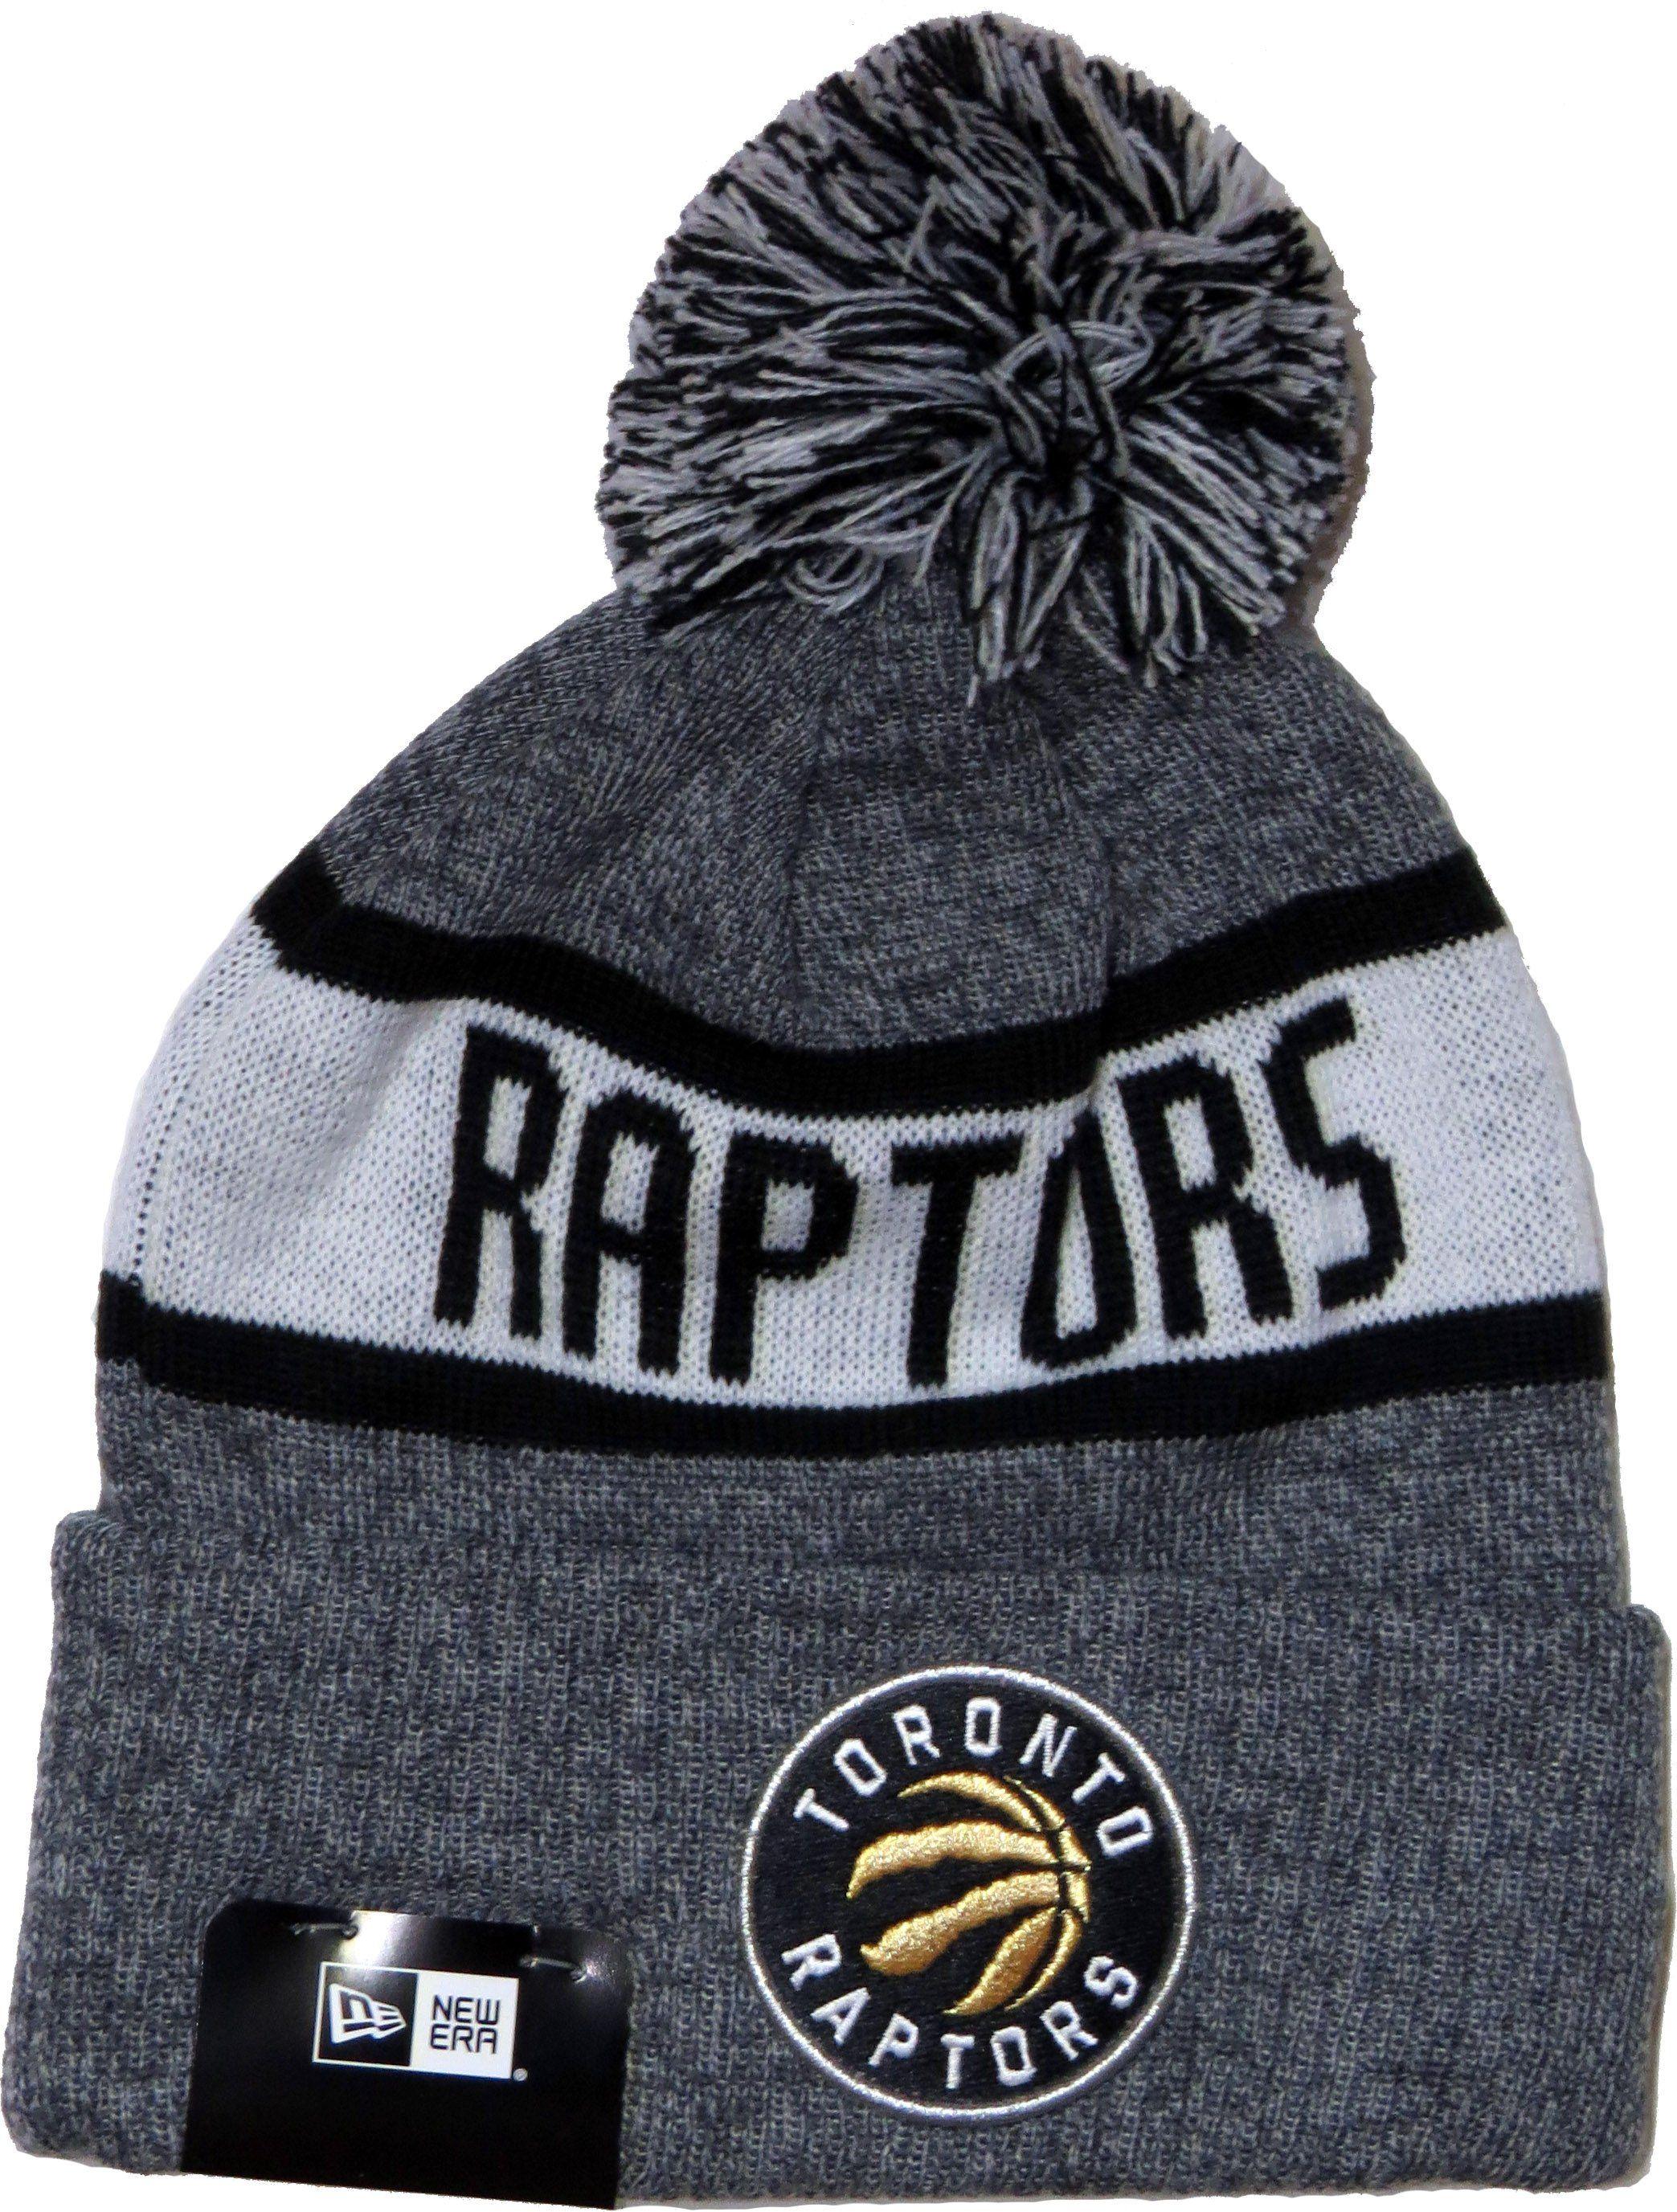 New Era NBA Team 2017 Marl Knit Bobble Hat. Grey with the Toronto Raptors 2f11ef8a683